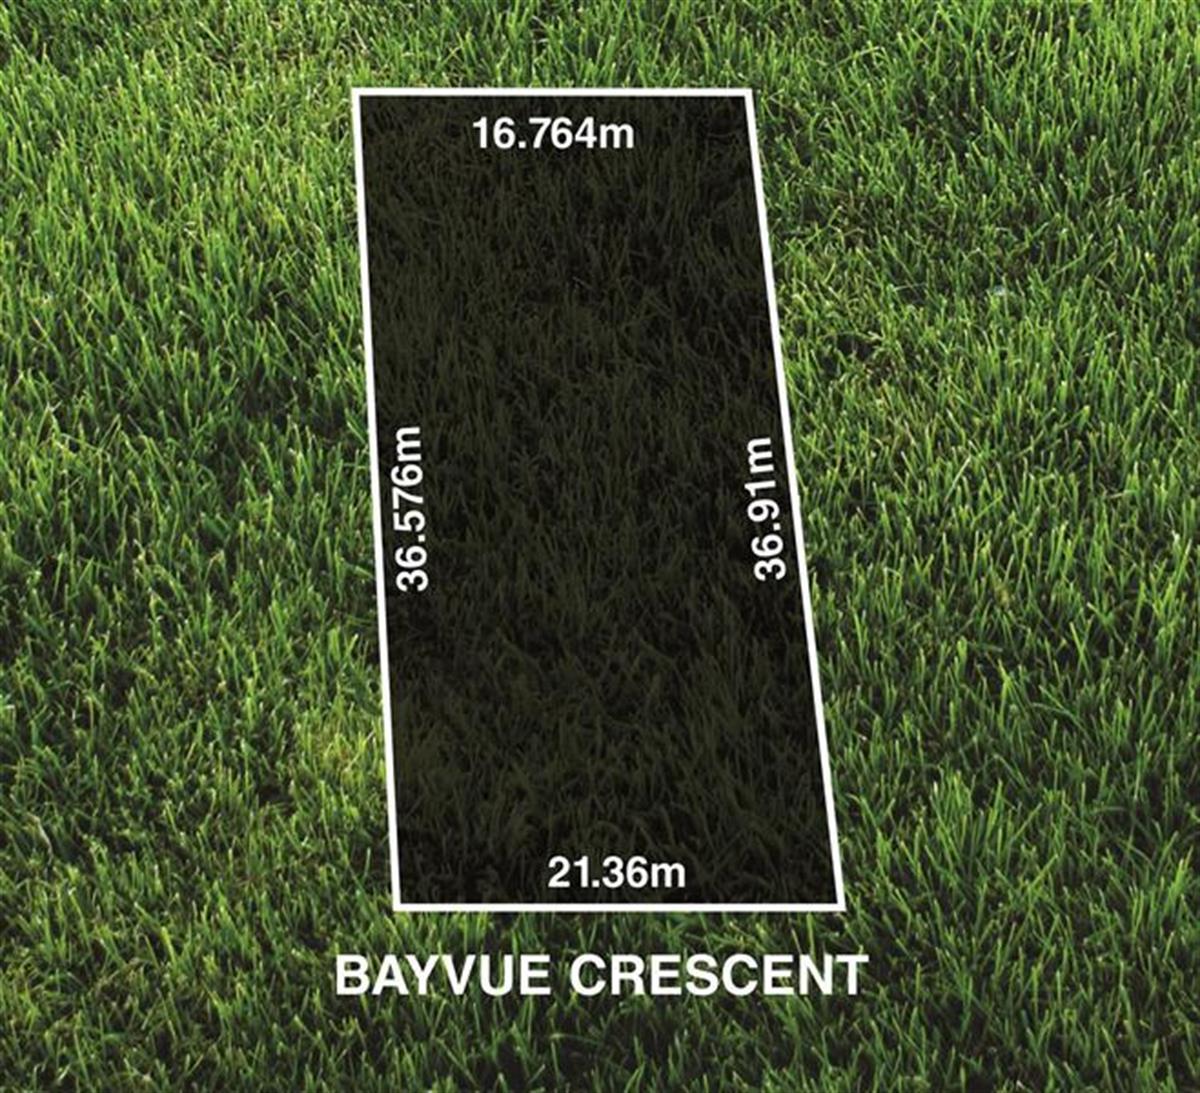 15-bayvue-crescent-ridgehaven-5097-sa